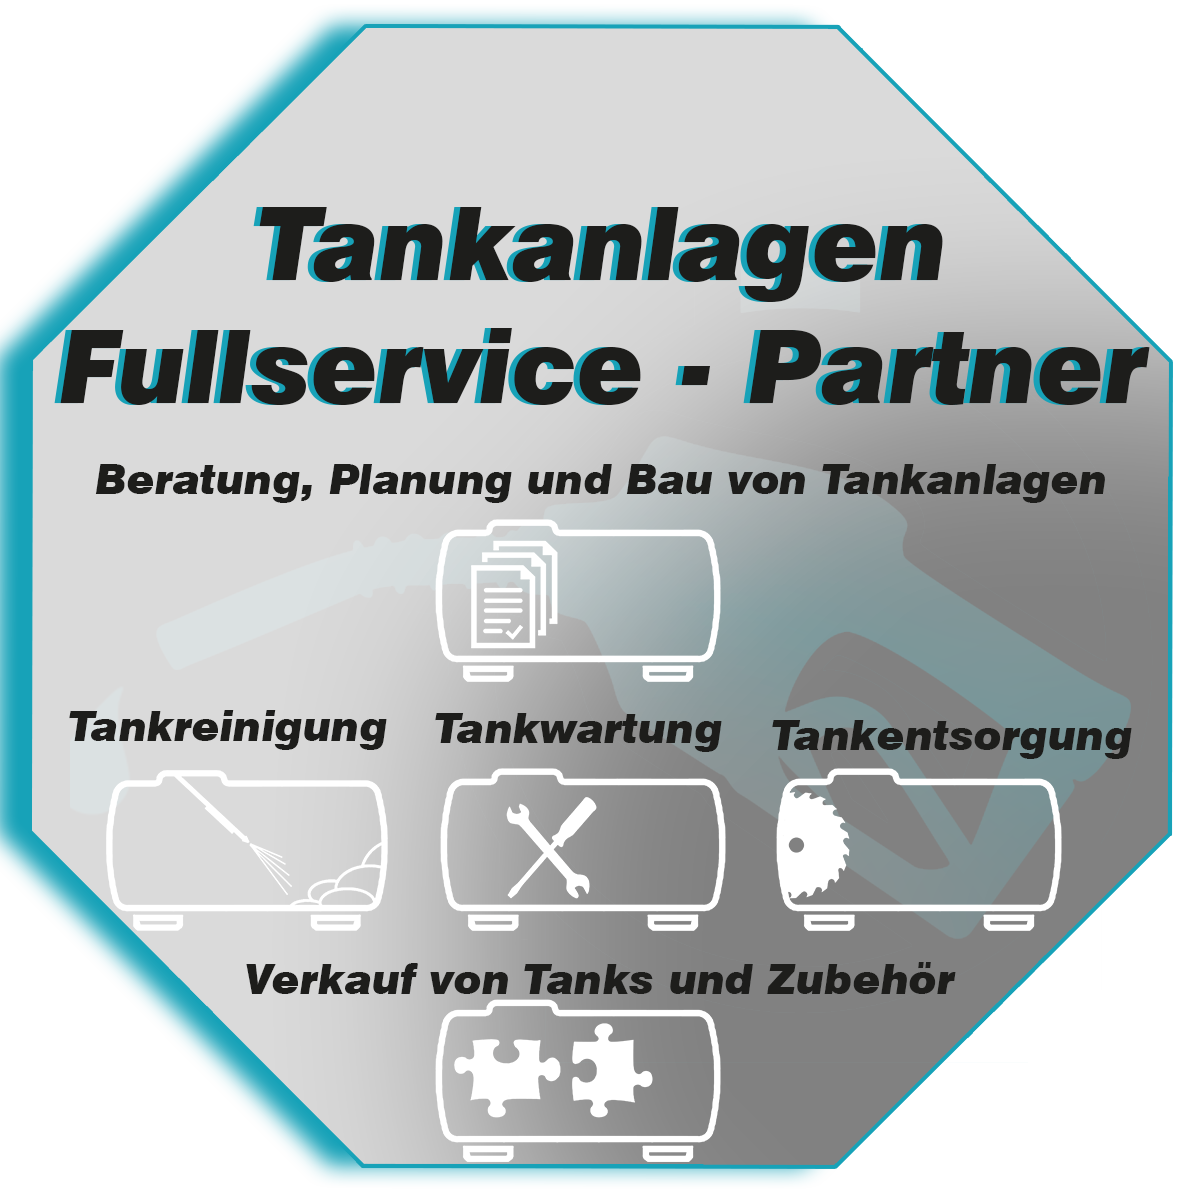 Fullservice-Tankanlagen